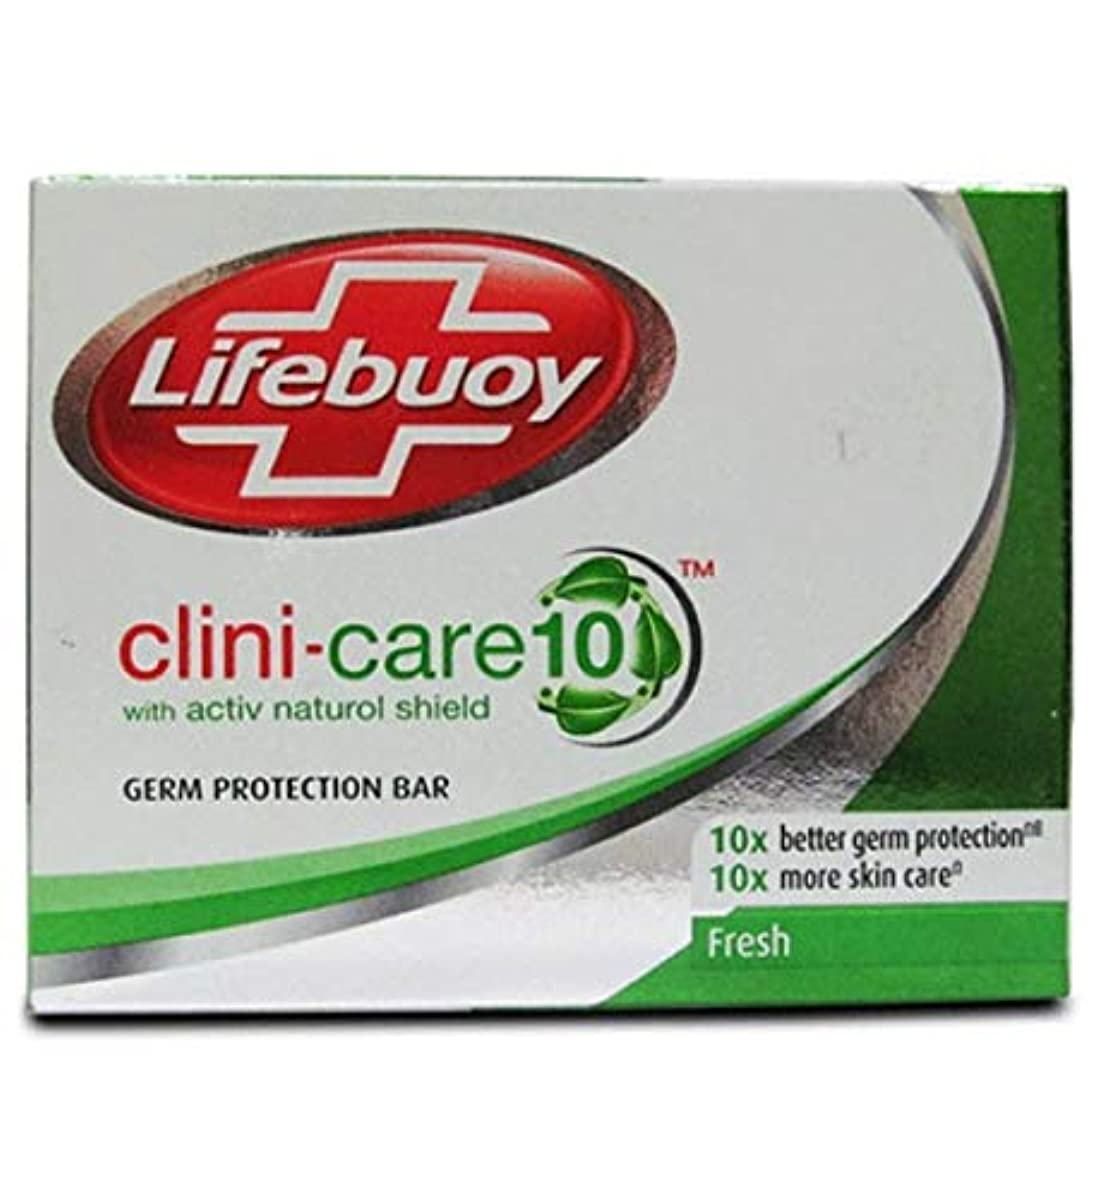 Lifebuoyバーソープクリニシールド10フレッシュアンチバクテリア、70グラム (6個パック)